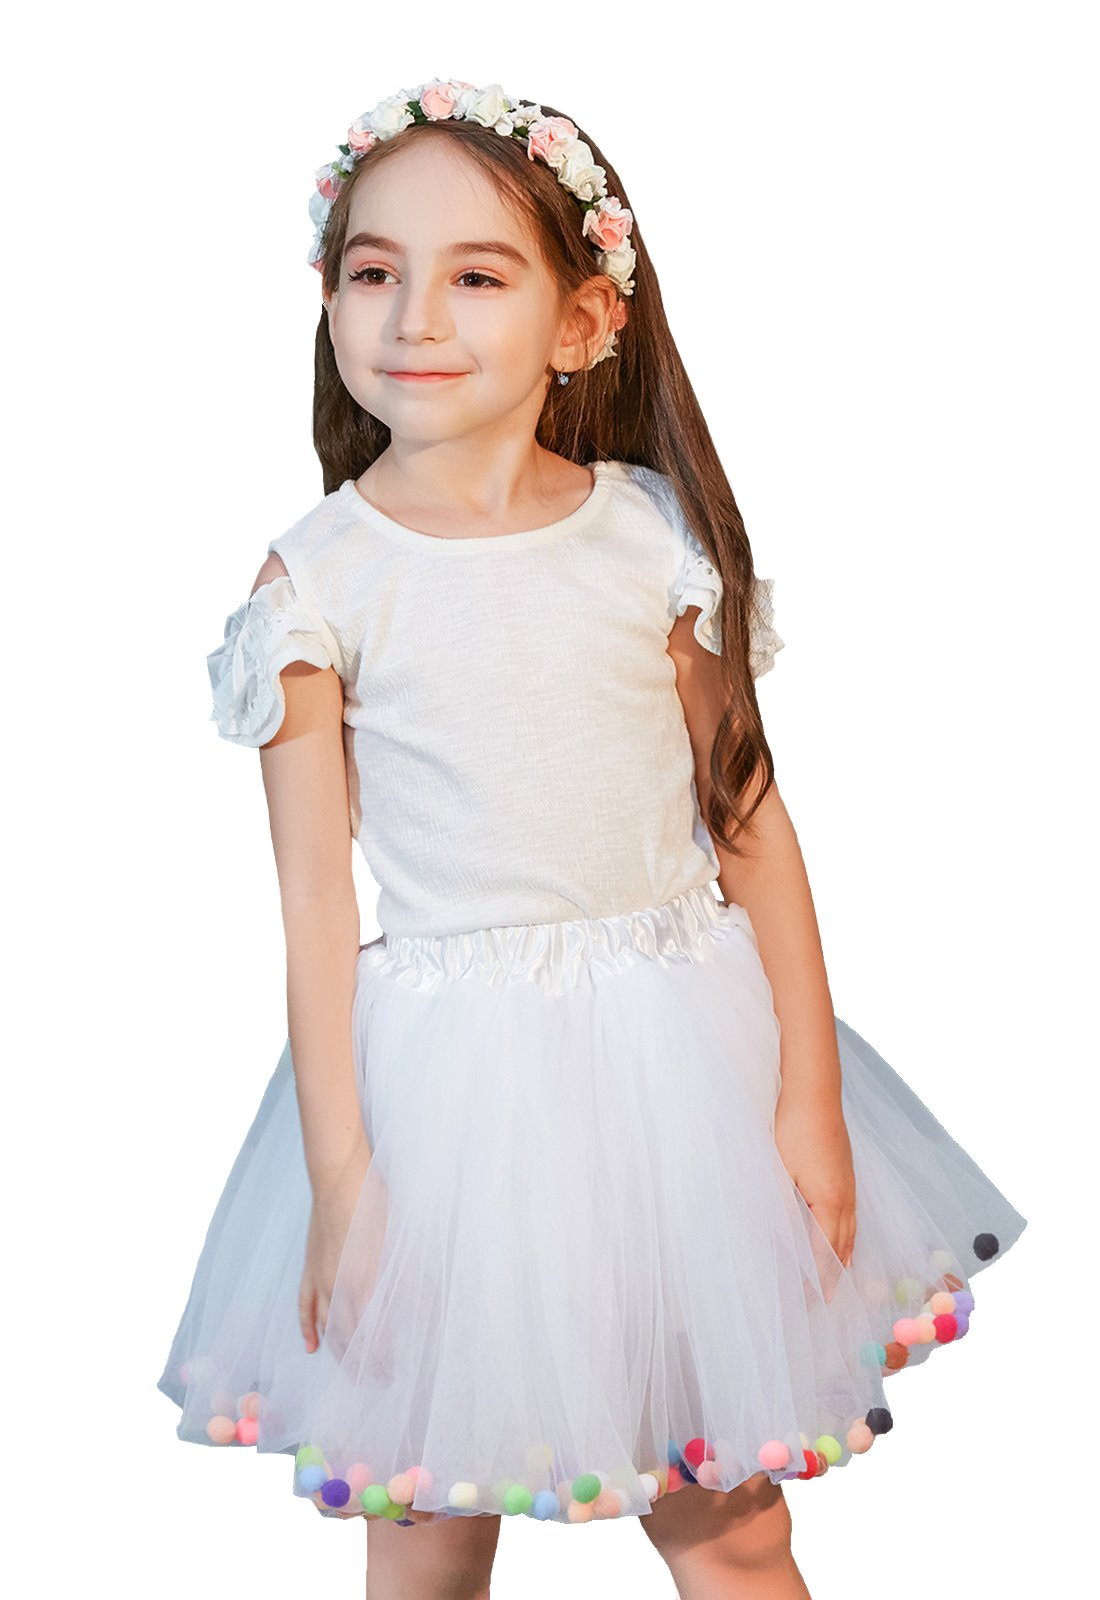 Buenos Ninos Girl's 3 Layers Sequin Ballet Dance Skirt with Pom Pom Puff Ball Dress-up Tutu White